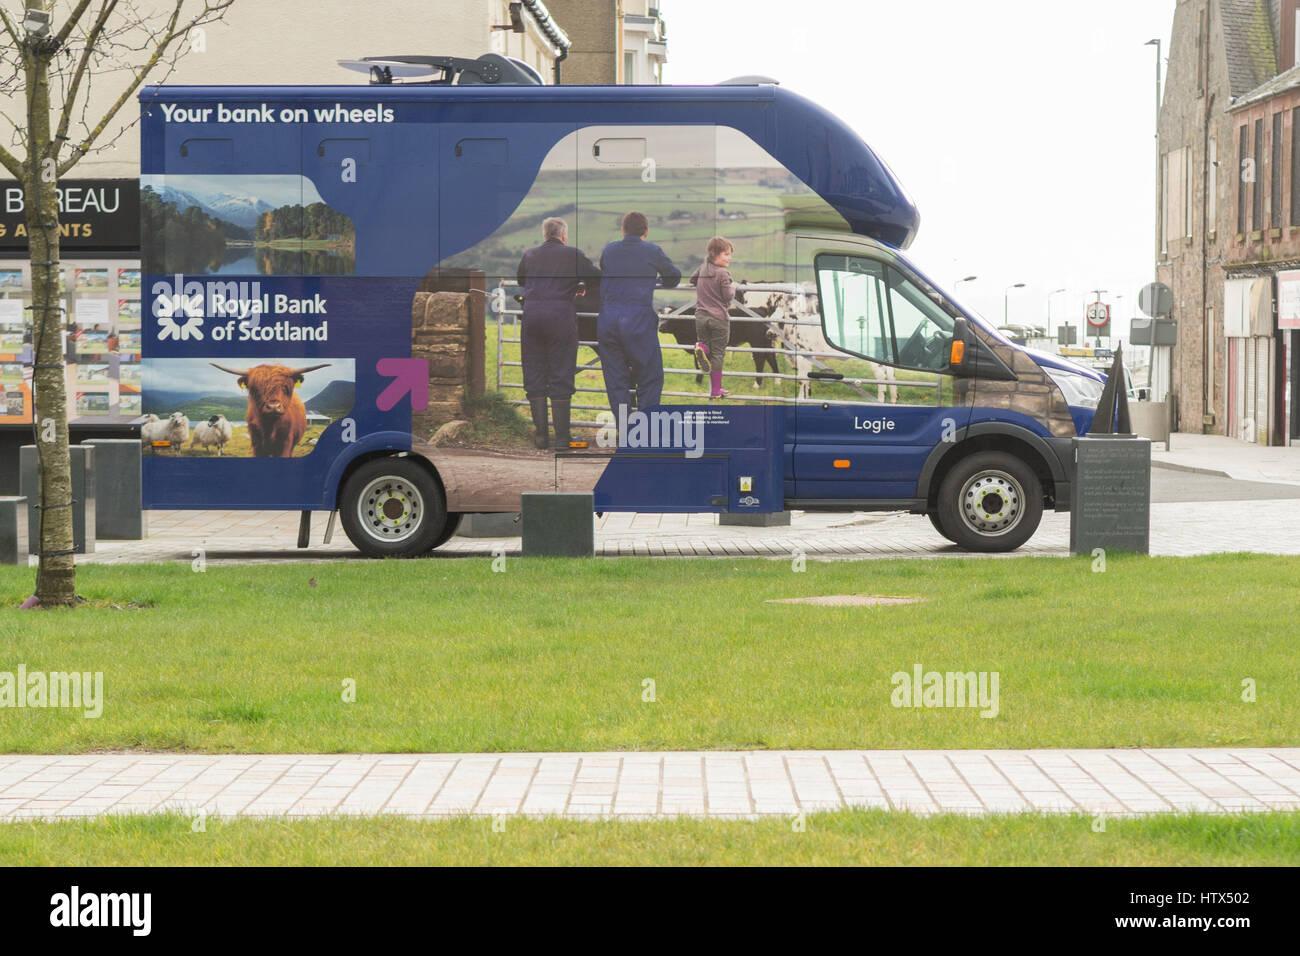 RBS Royal Bank of Scotland van mobile Immagini Stock